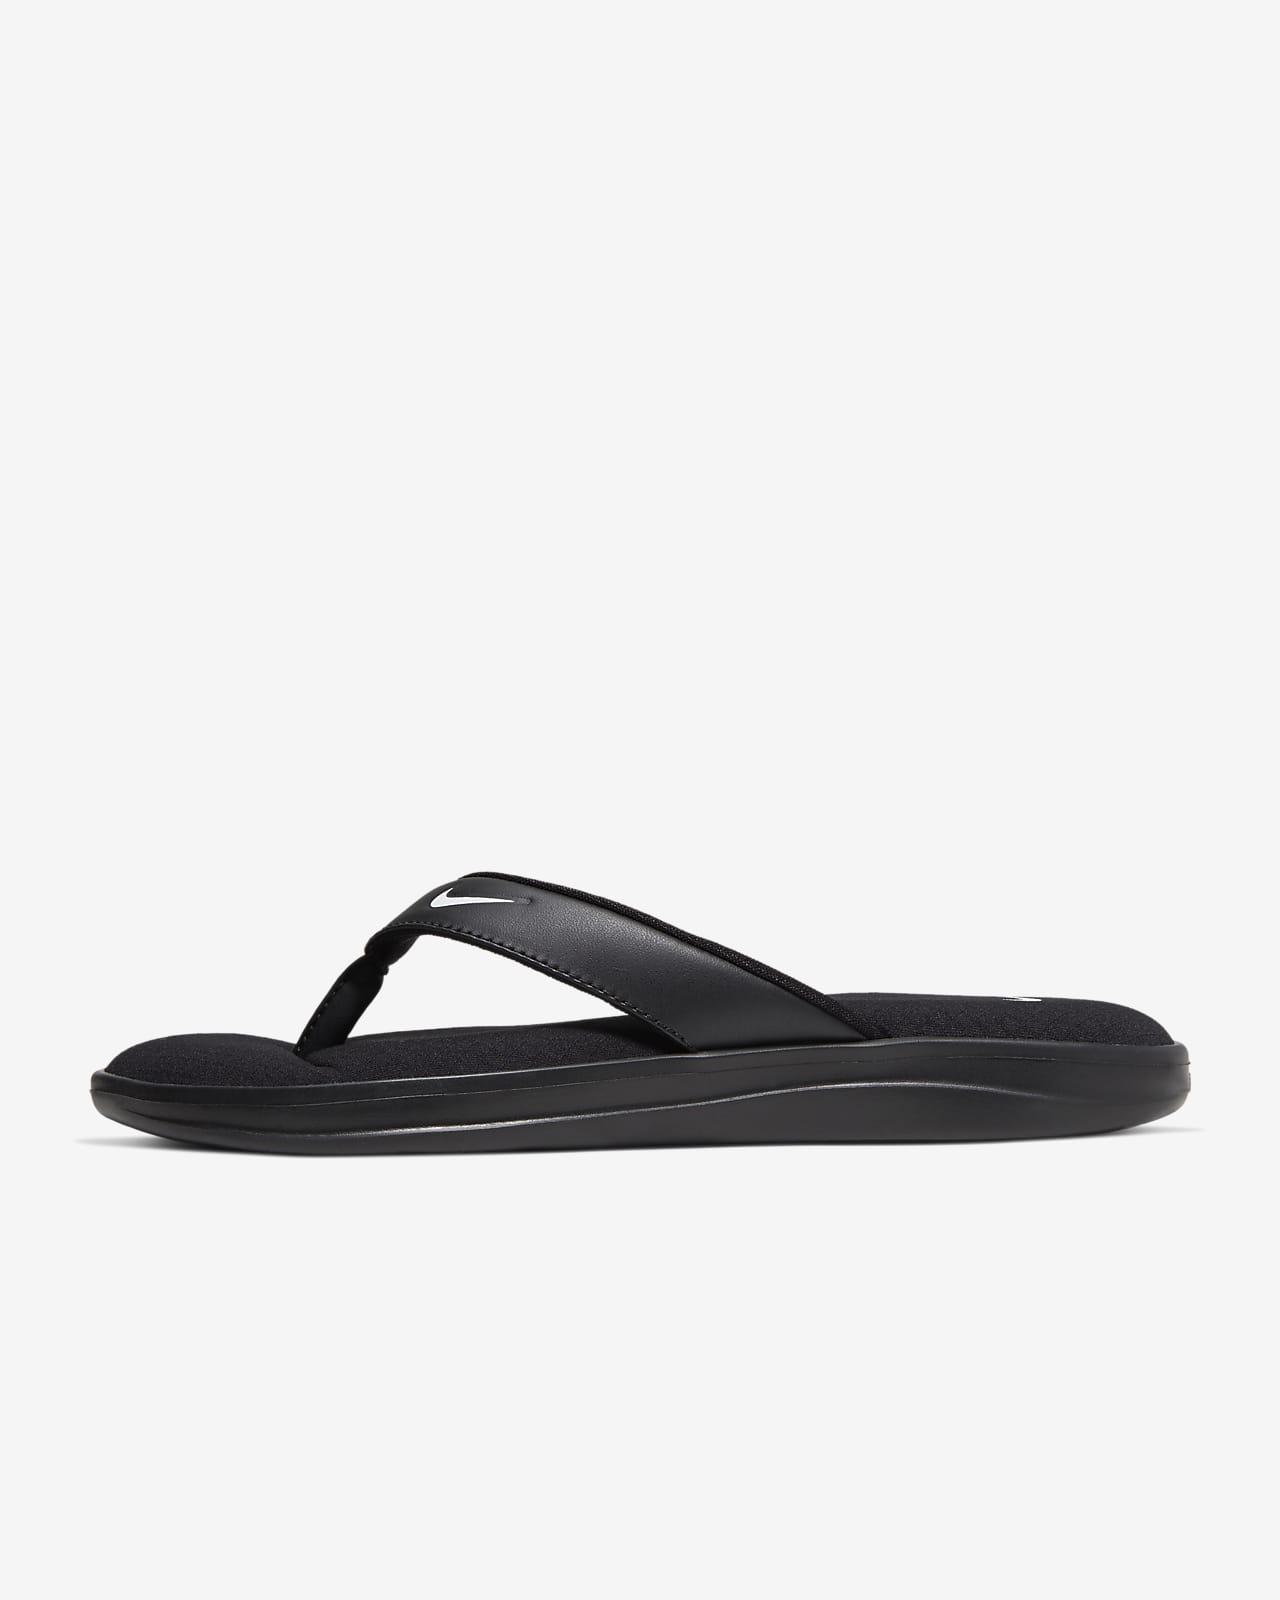 Nike Ultra Comfort 3 Women's Thong Sandals